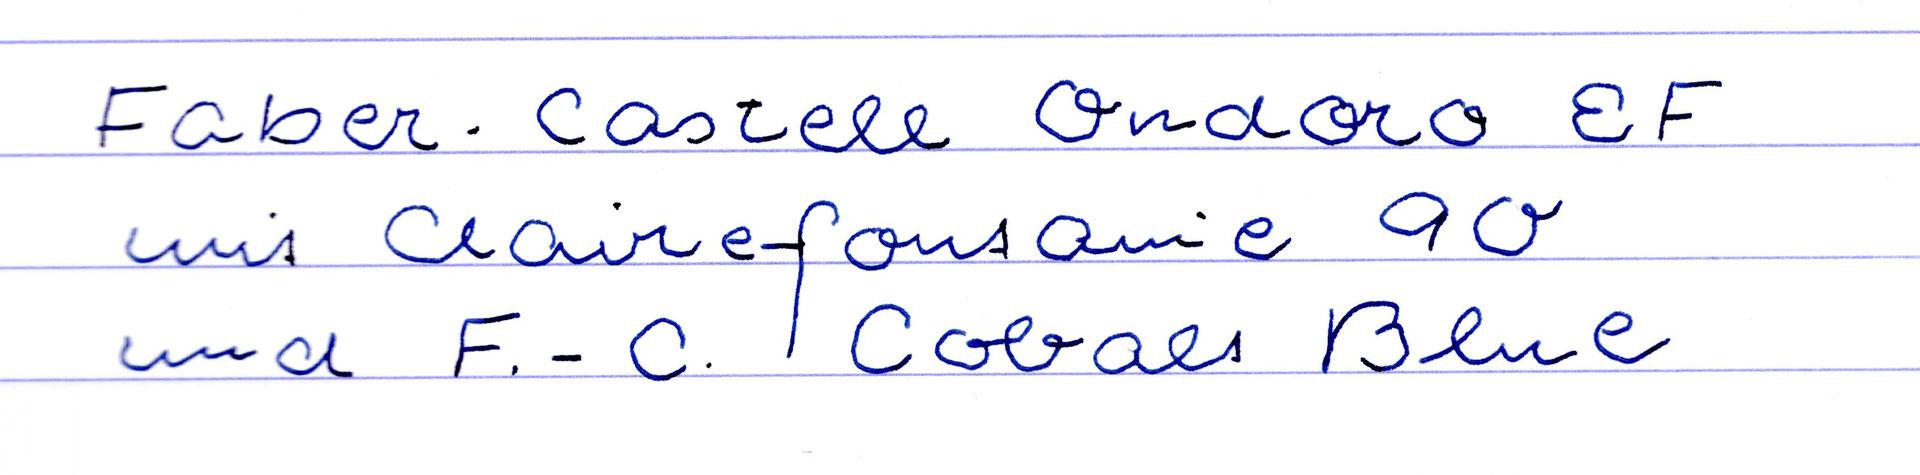 Graf Von Faber-Castell Cobalt Blue - Pens-And-Freaks: Freude in Faber Castell Tinte Dokumentenecht